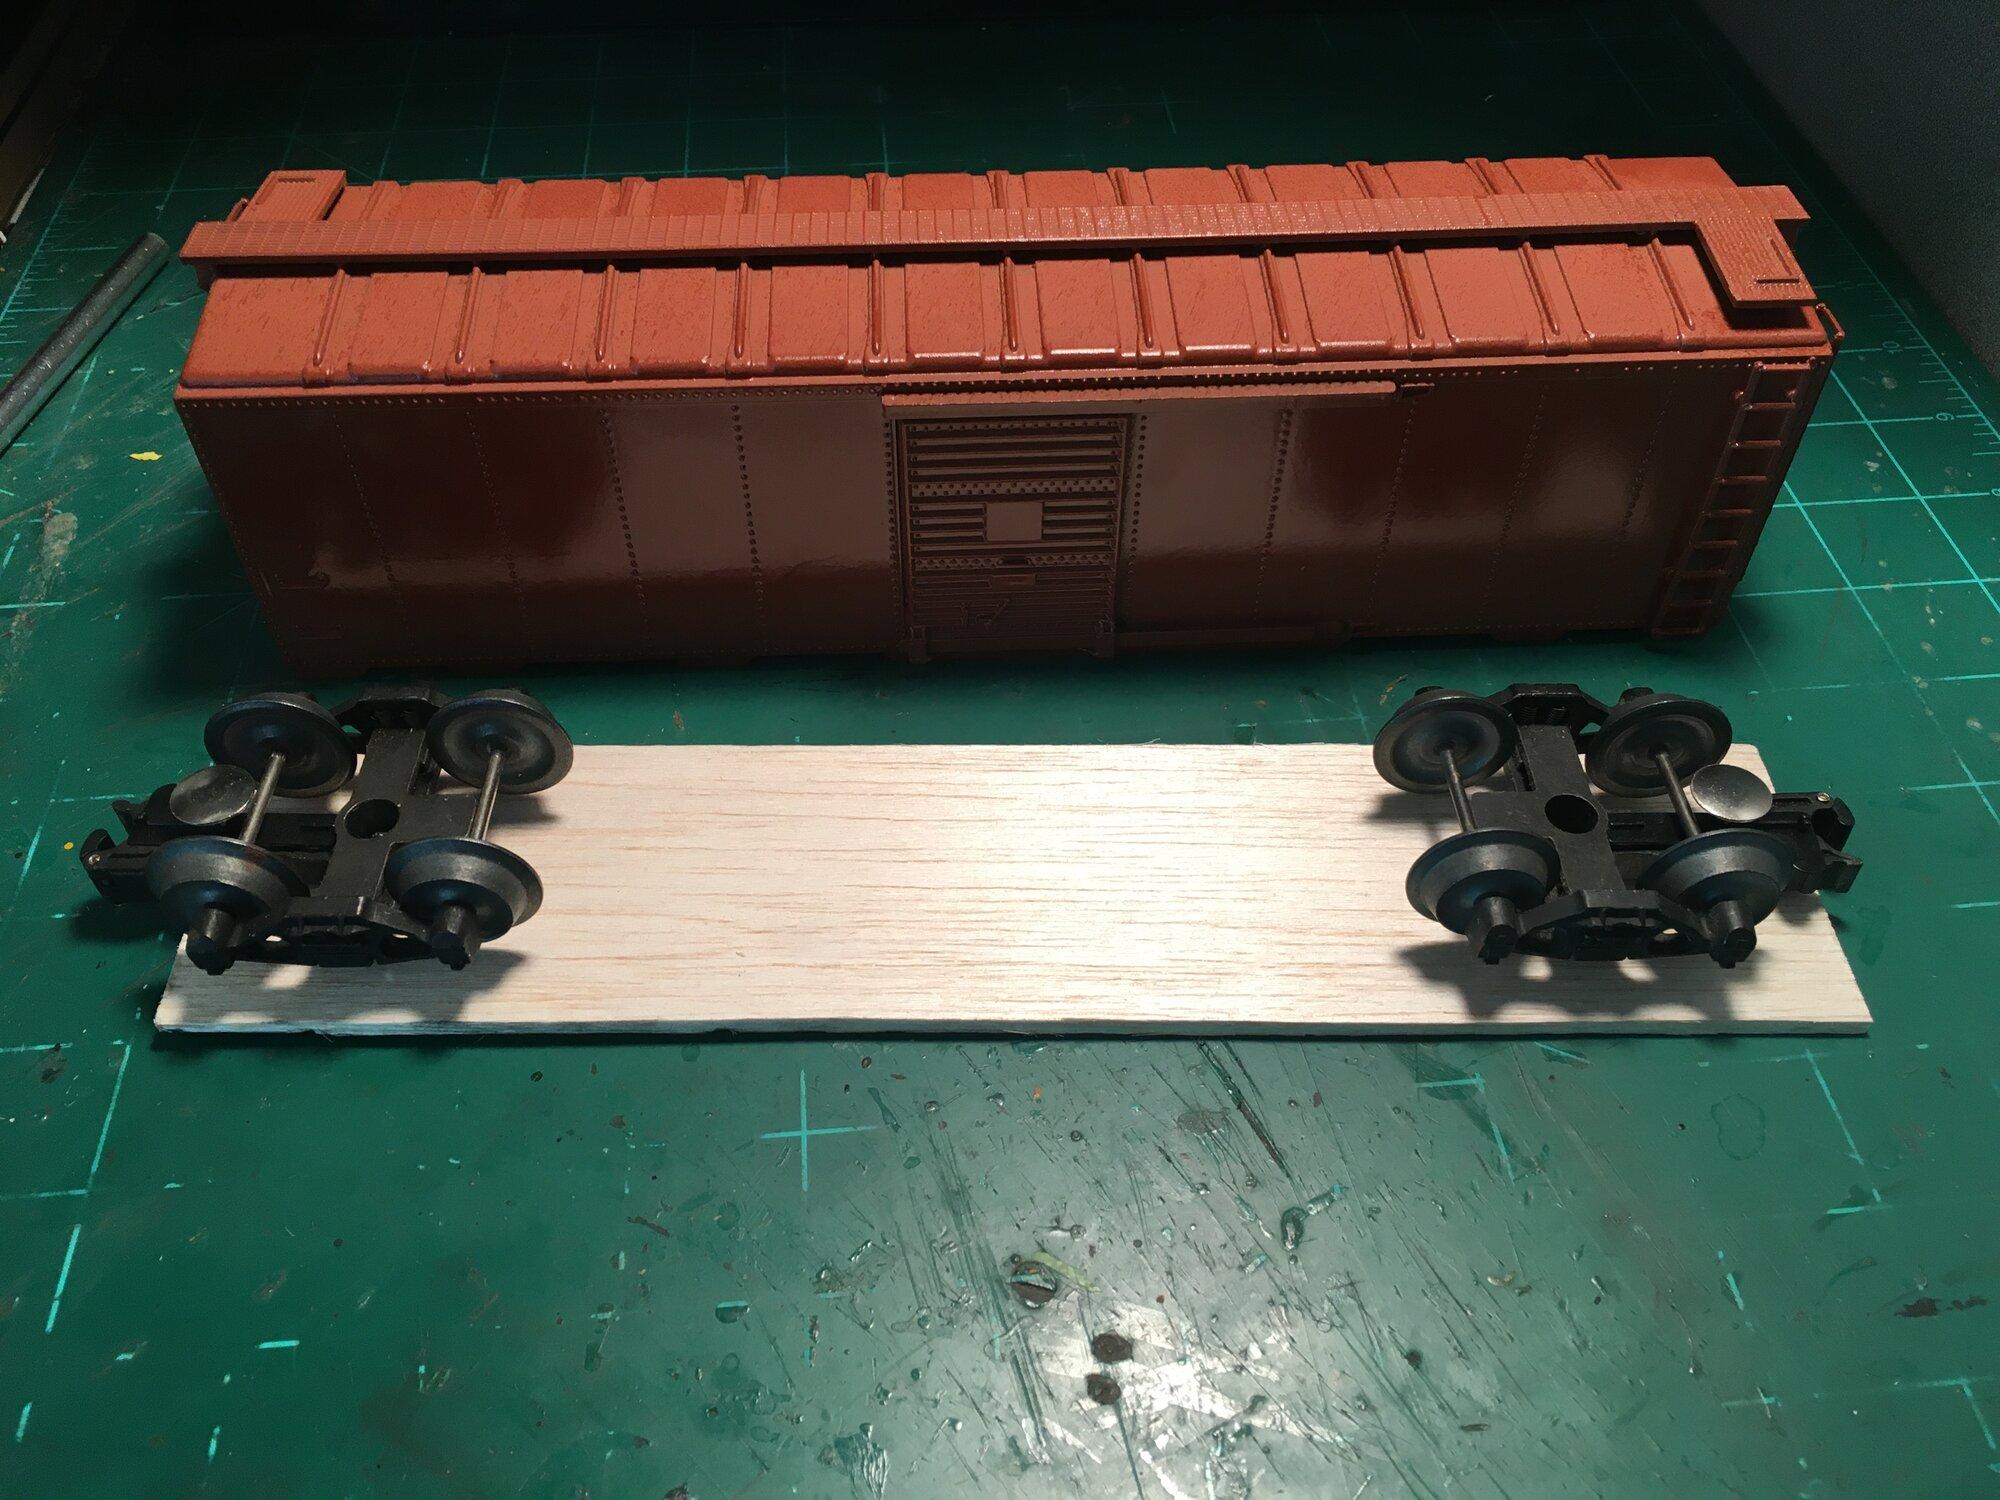 1D365A69-7CE4-44B5-AC3D-D3E6276E79DC.jpeg